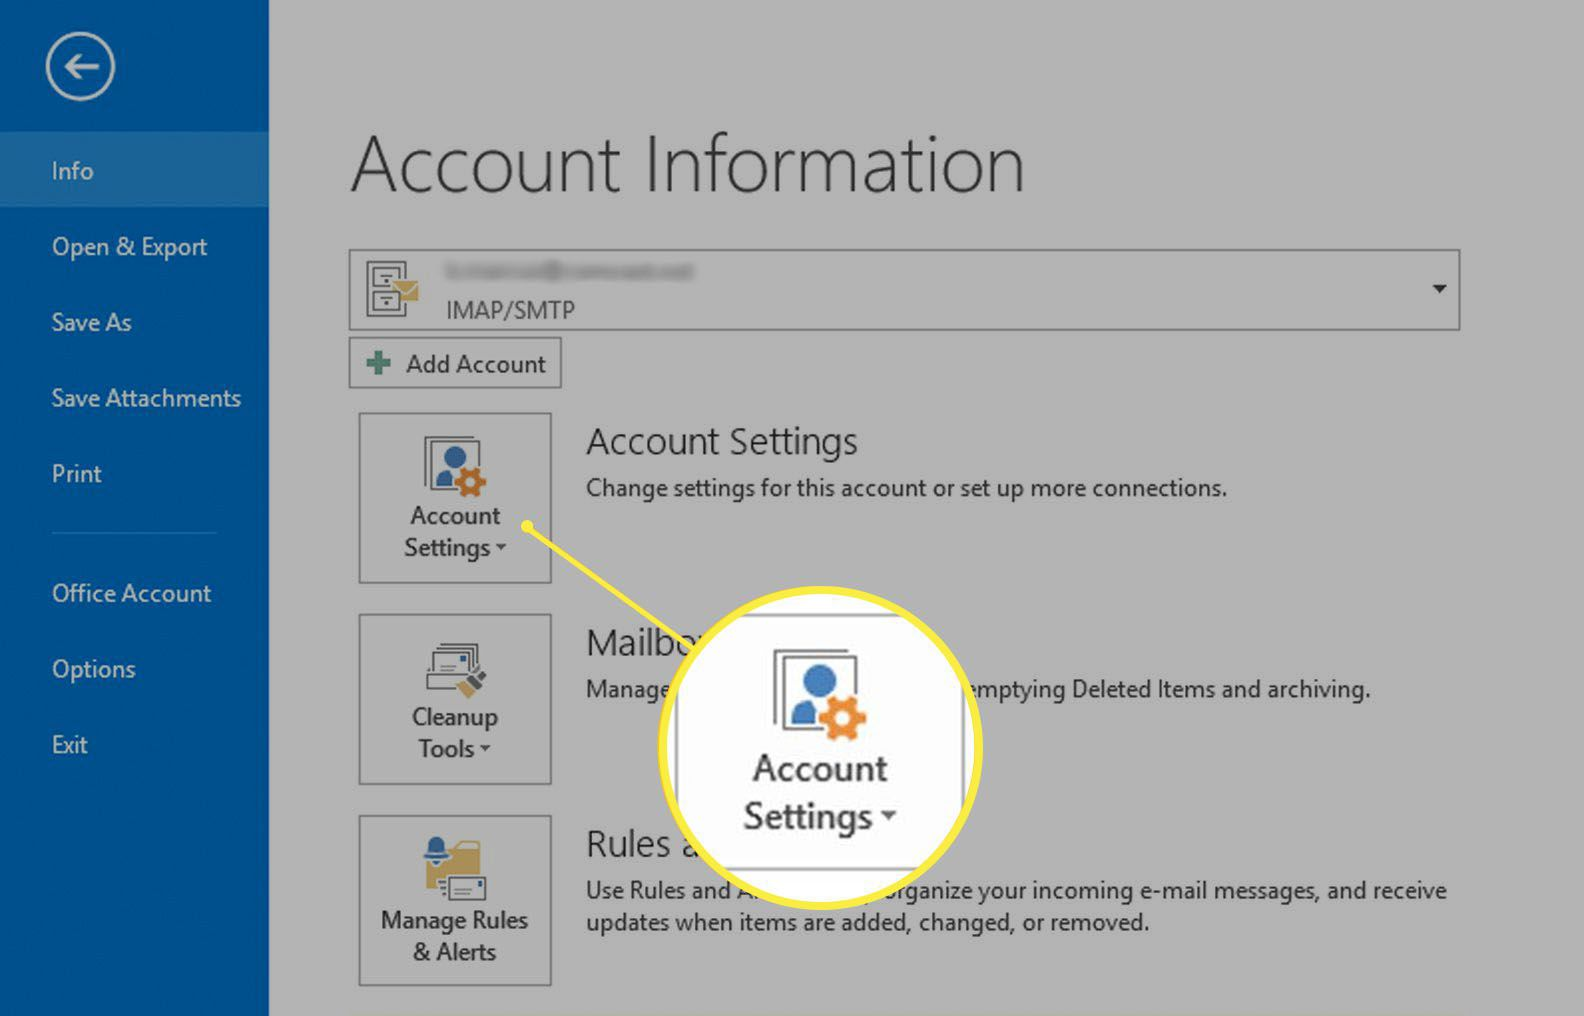 Account Settings in Outlook.